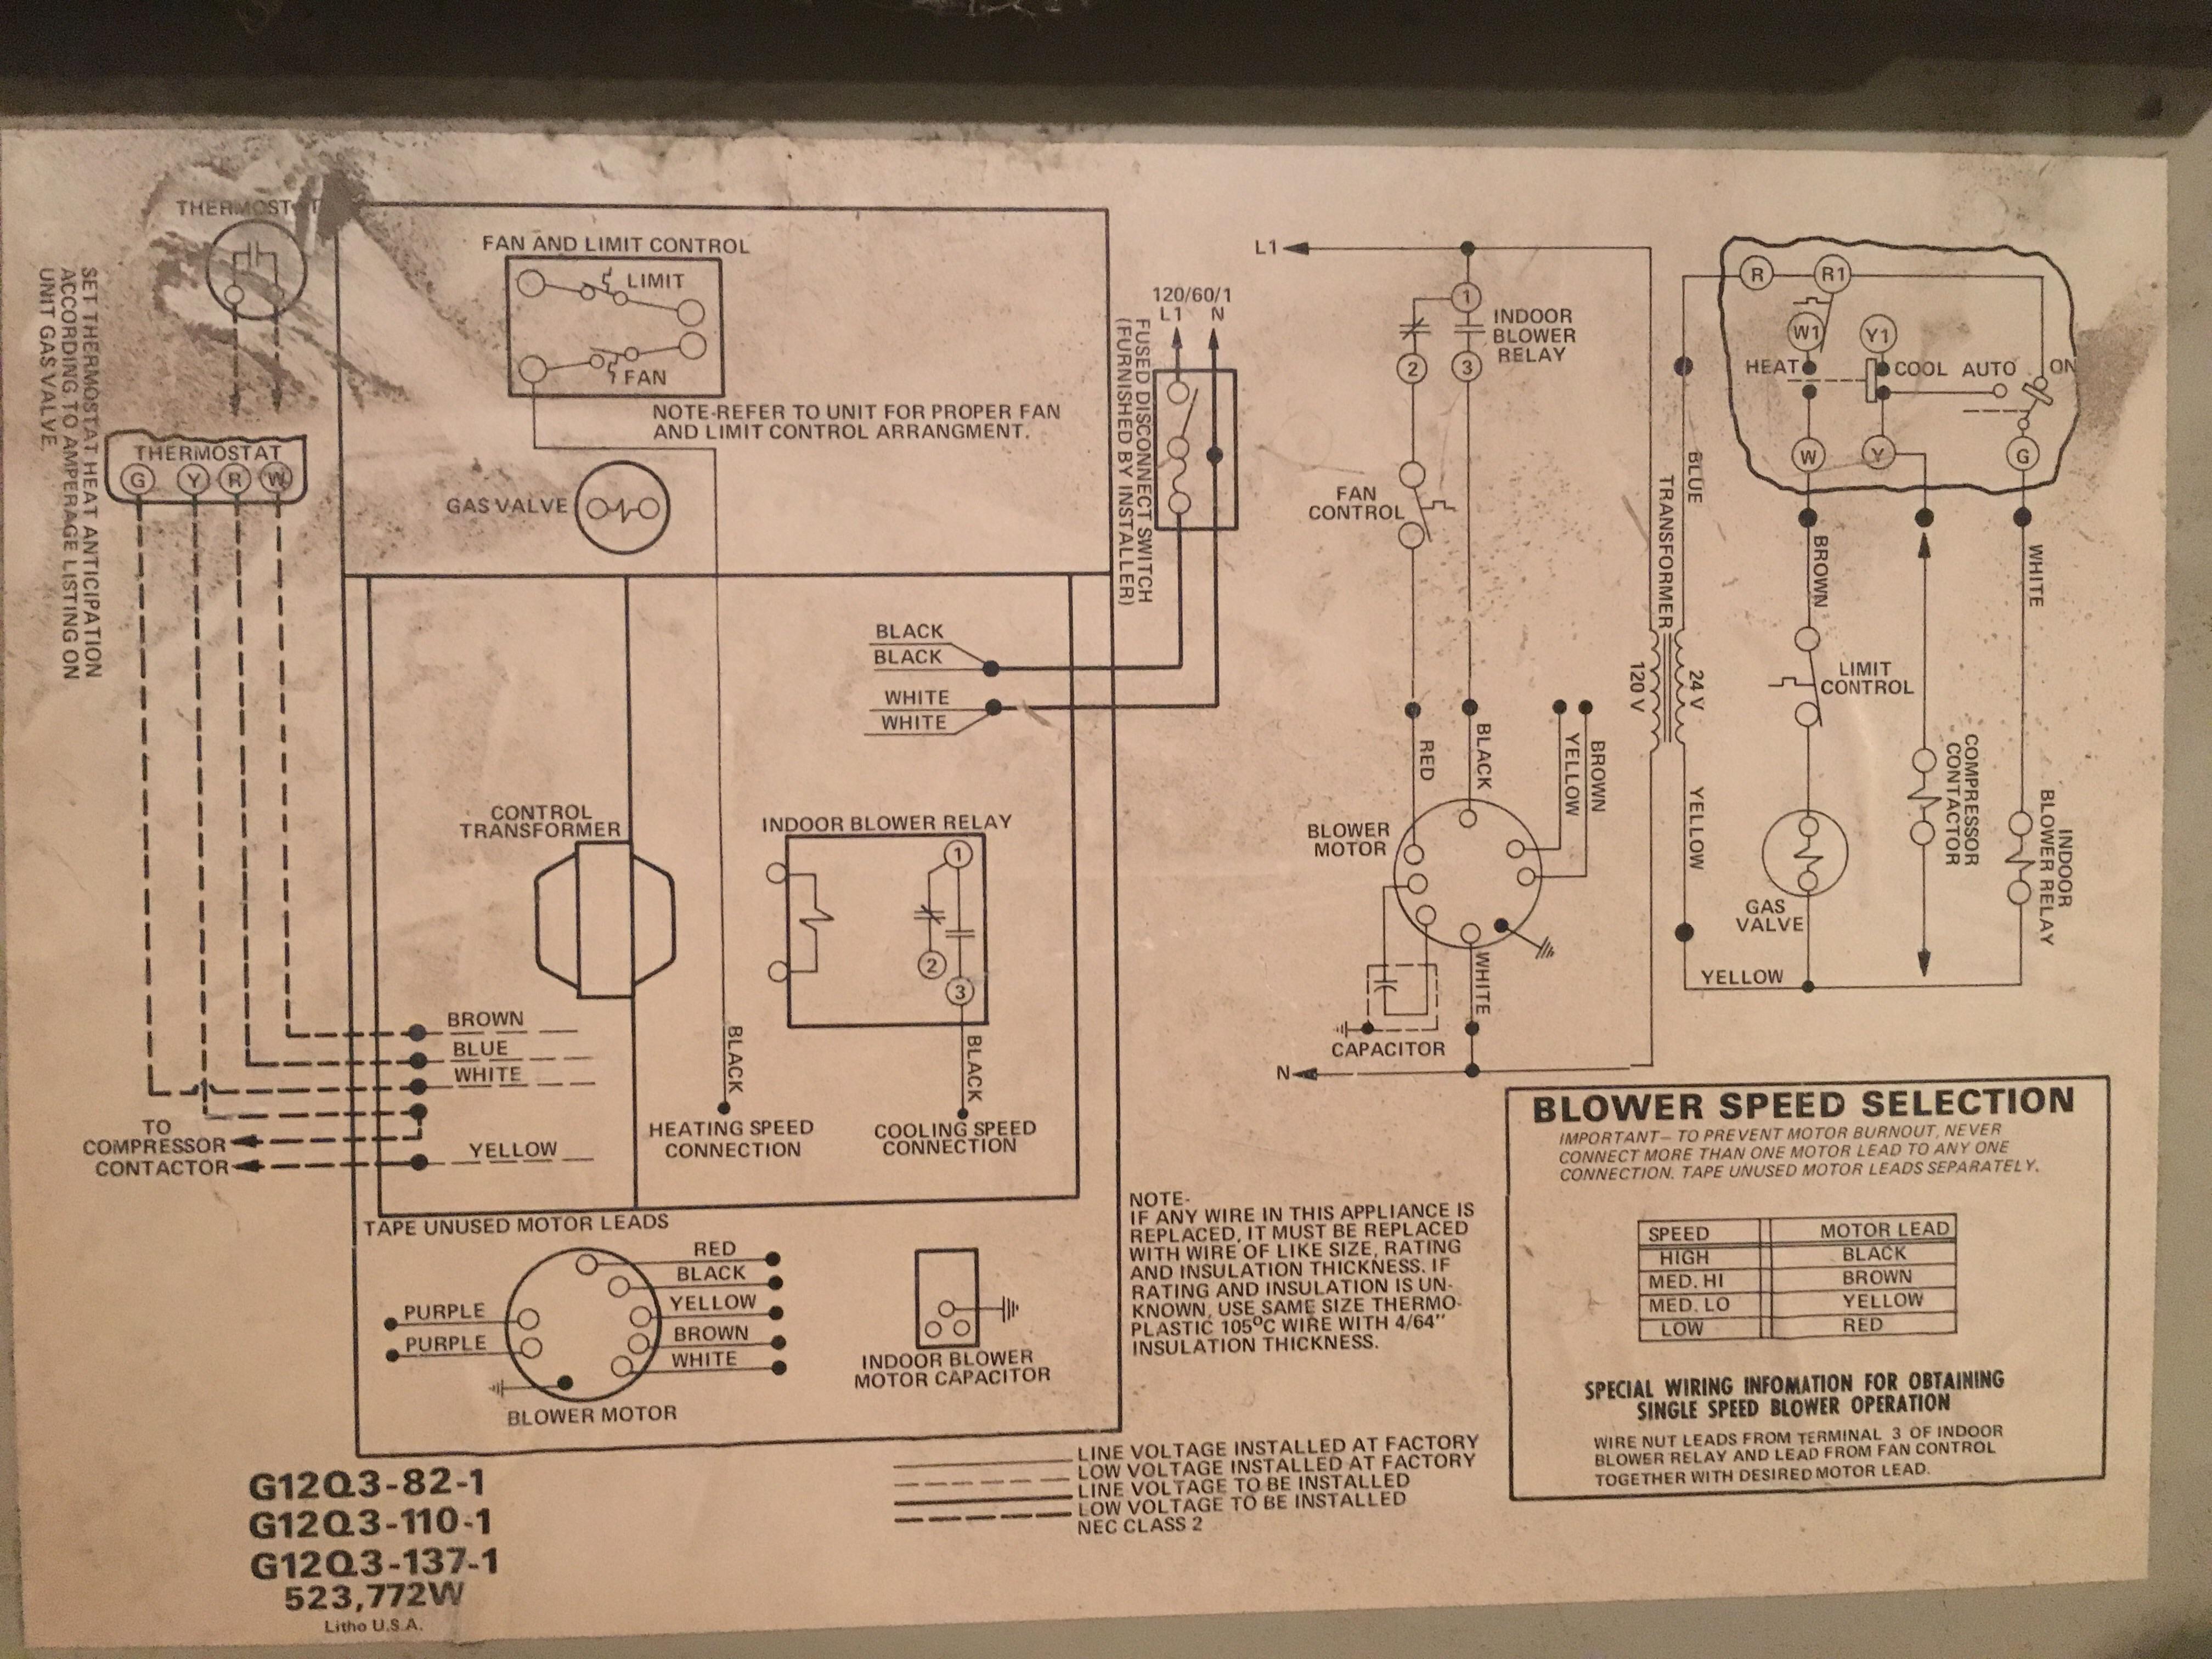 Lennox Furnace Wiring Diagram Wiring Diagram For Lennox Gas Furnace